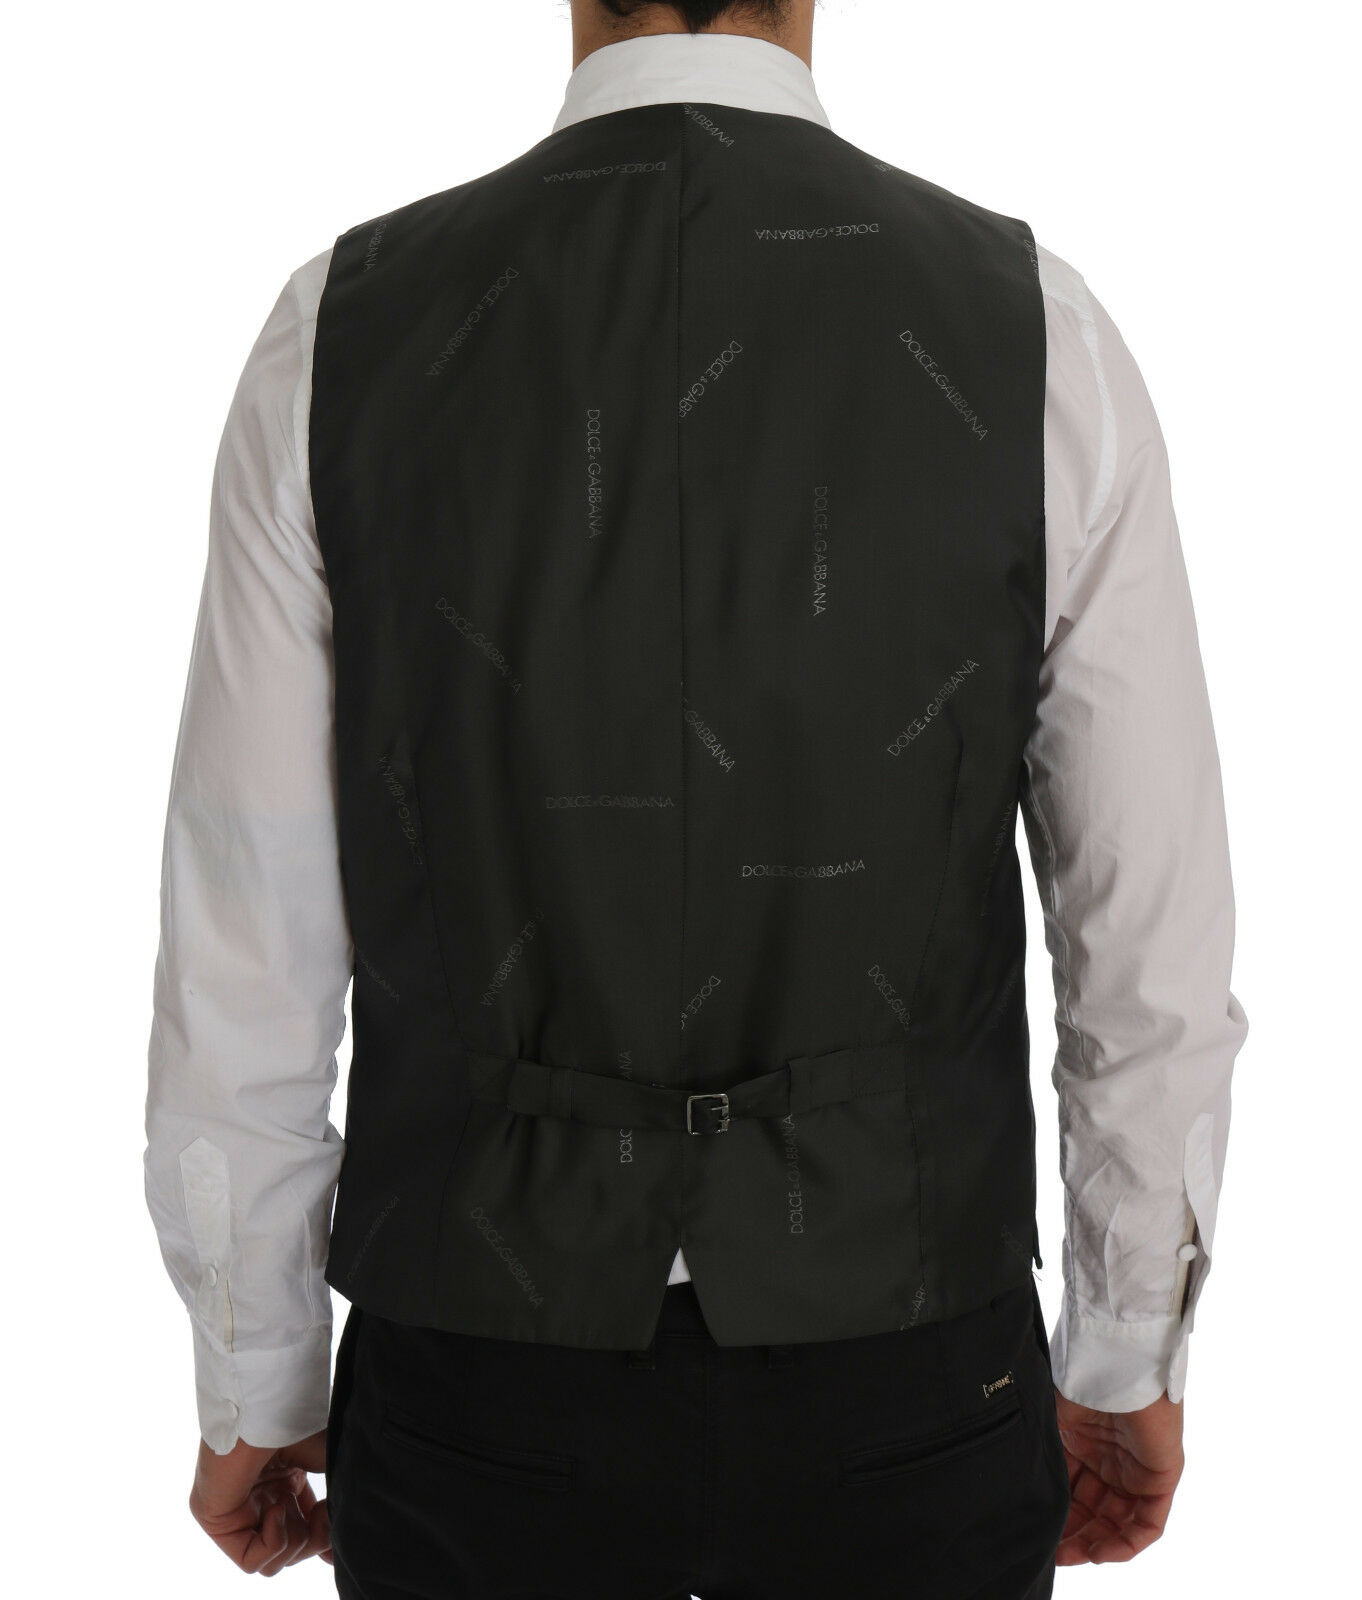 NEW  & 360 DOLCE &  GABBANA STAFF Vest Waistcoat Gris Lana Stretch IT50 / US40 / L 935785